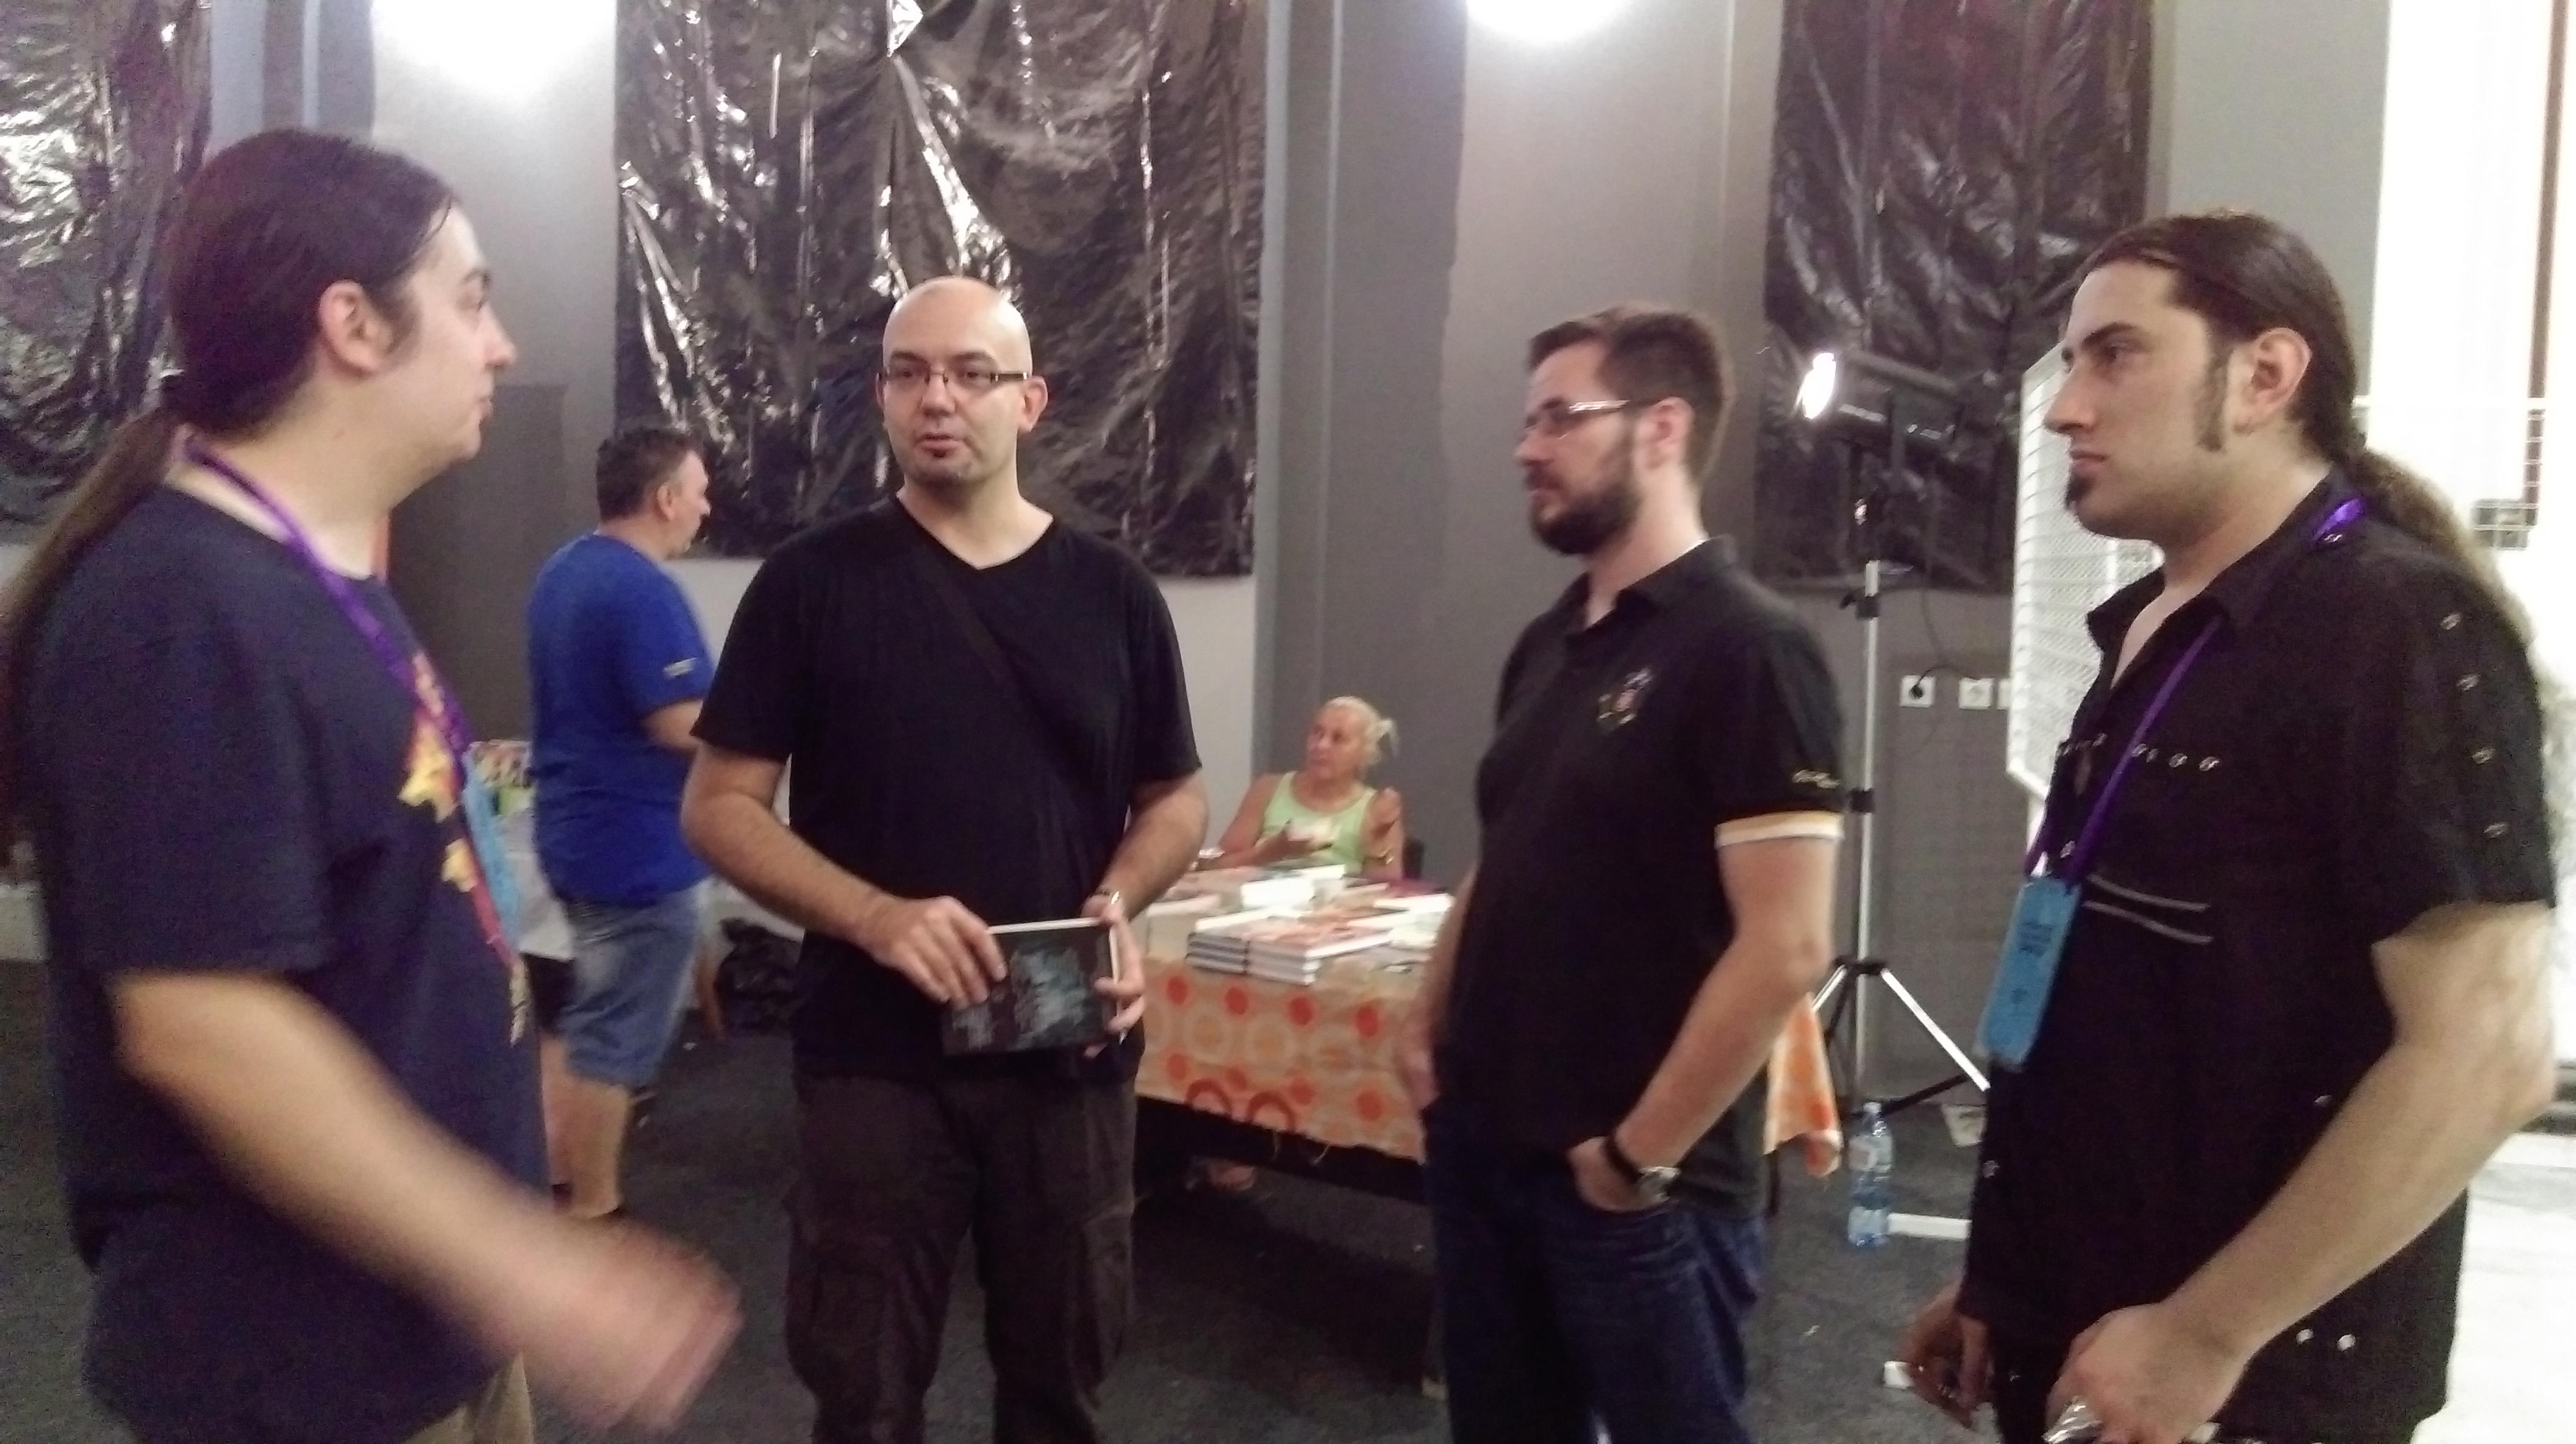 Prvi Festival epske i naučne fantastike u Somboru: Kad fantazija gradi prijateljstva (VIDEO)